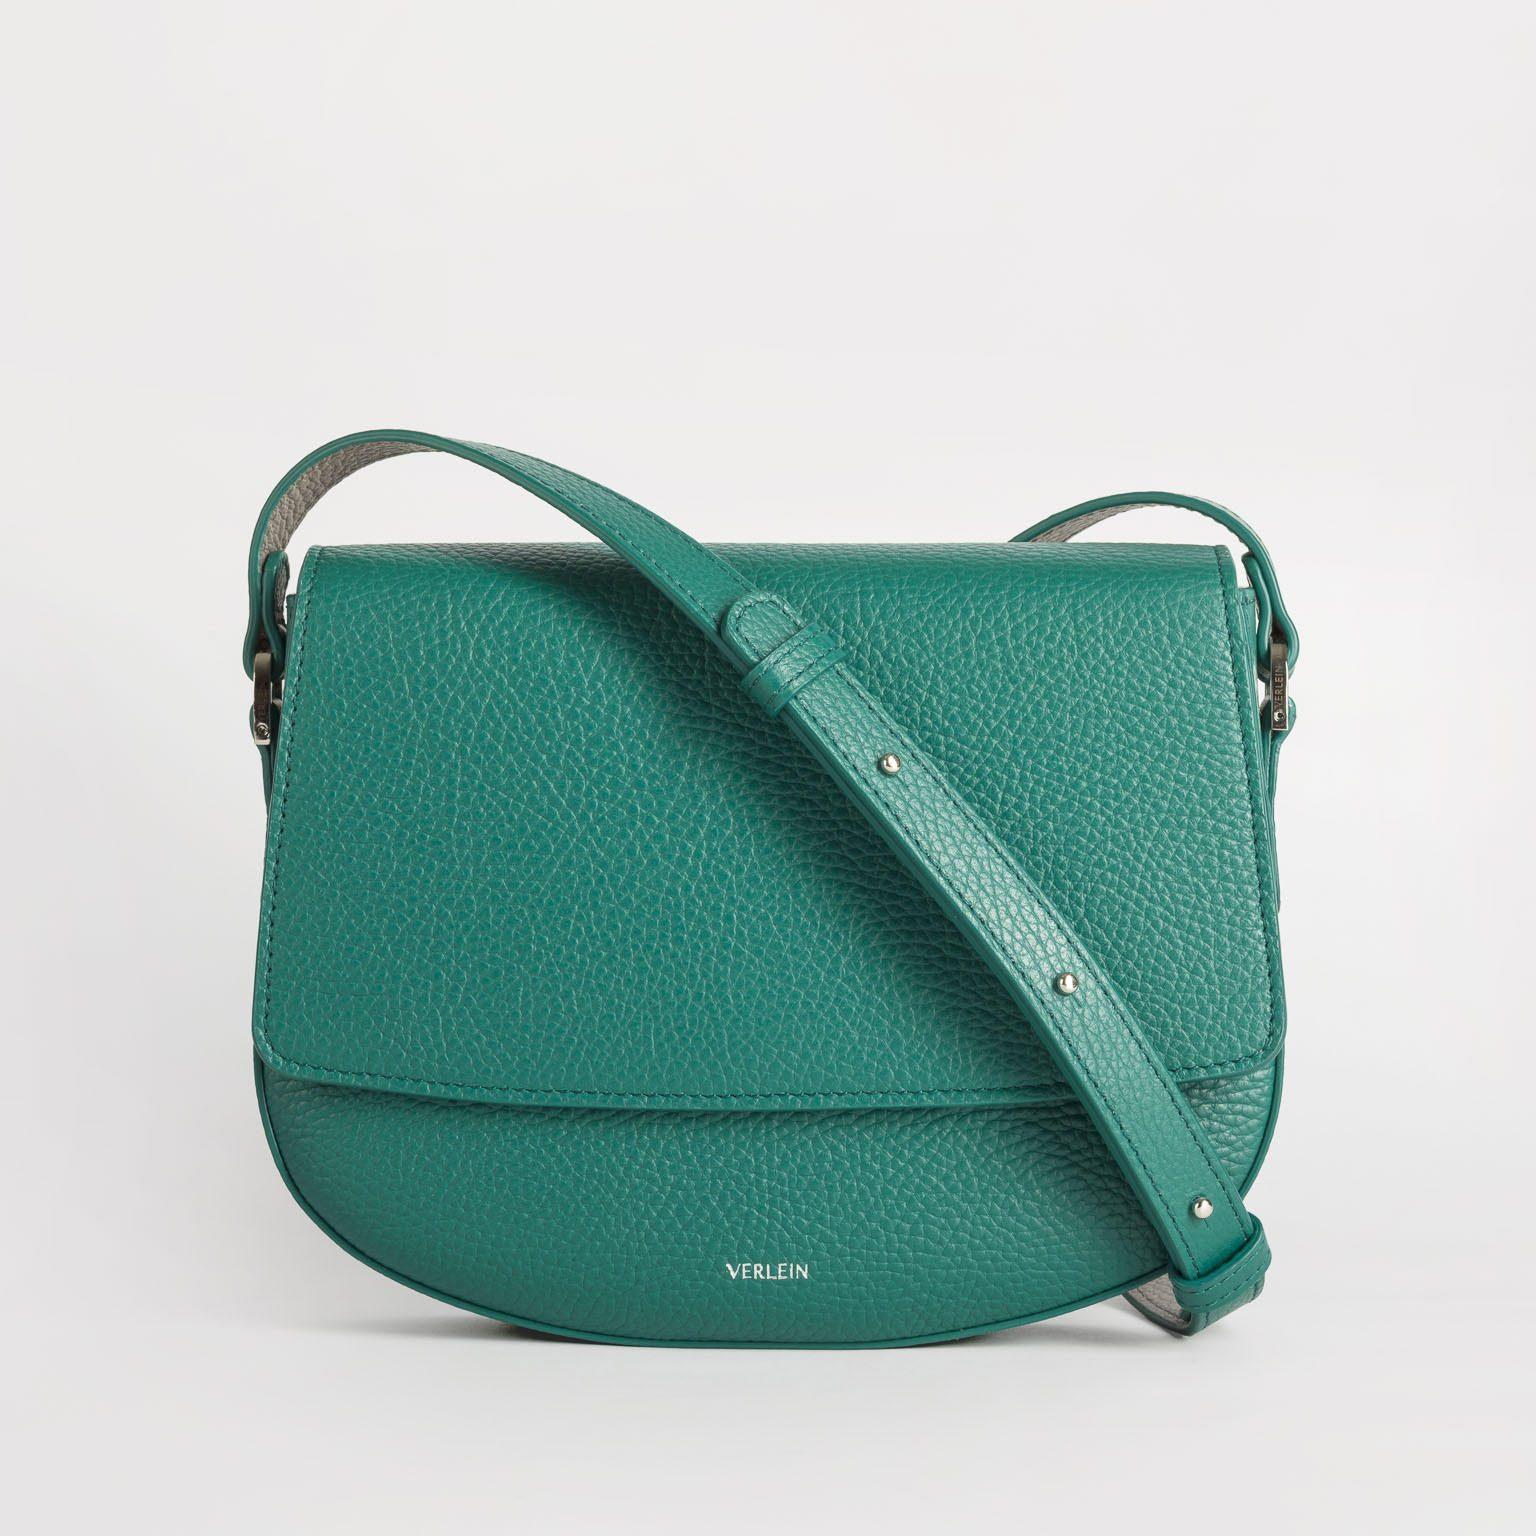 Emerald green Italian leather crossbody bag handmade by Czech brand Verlein